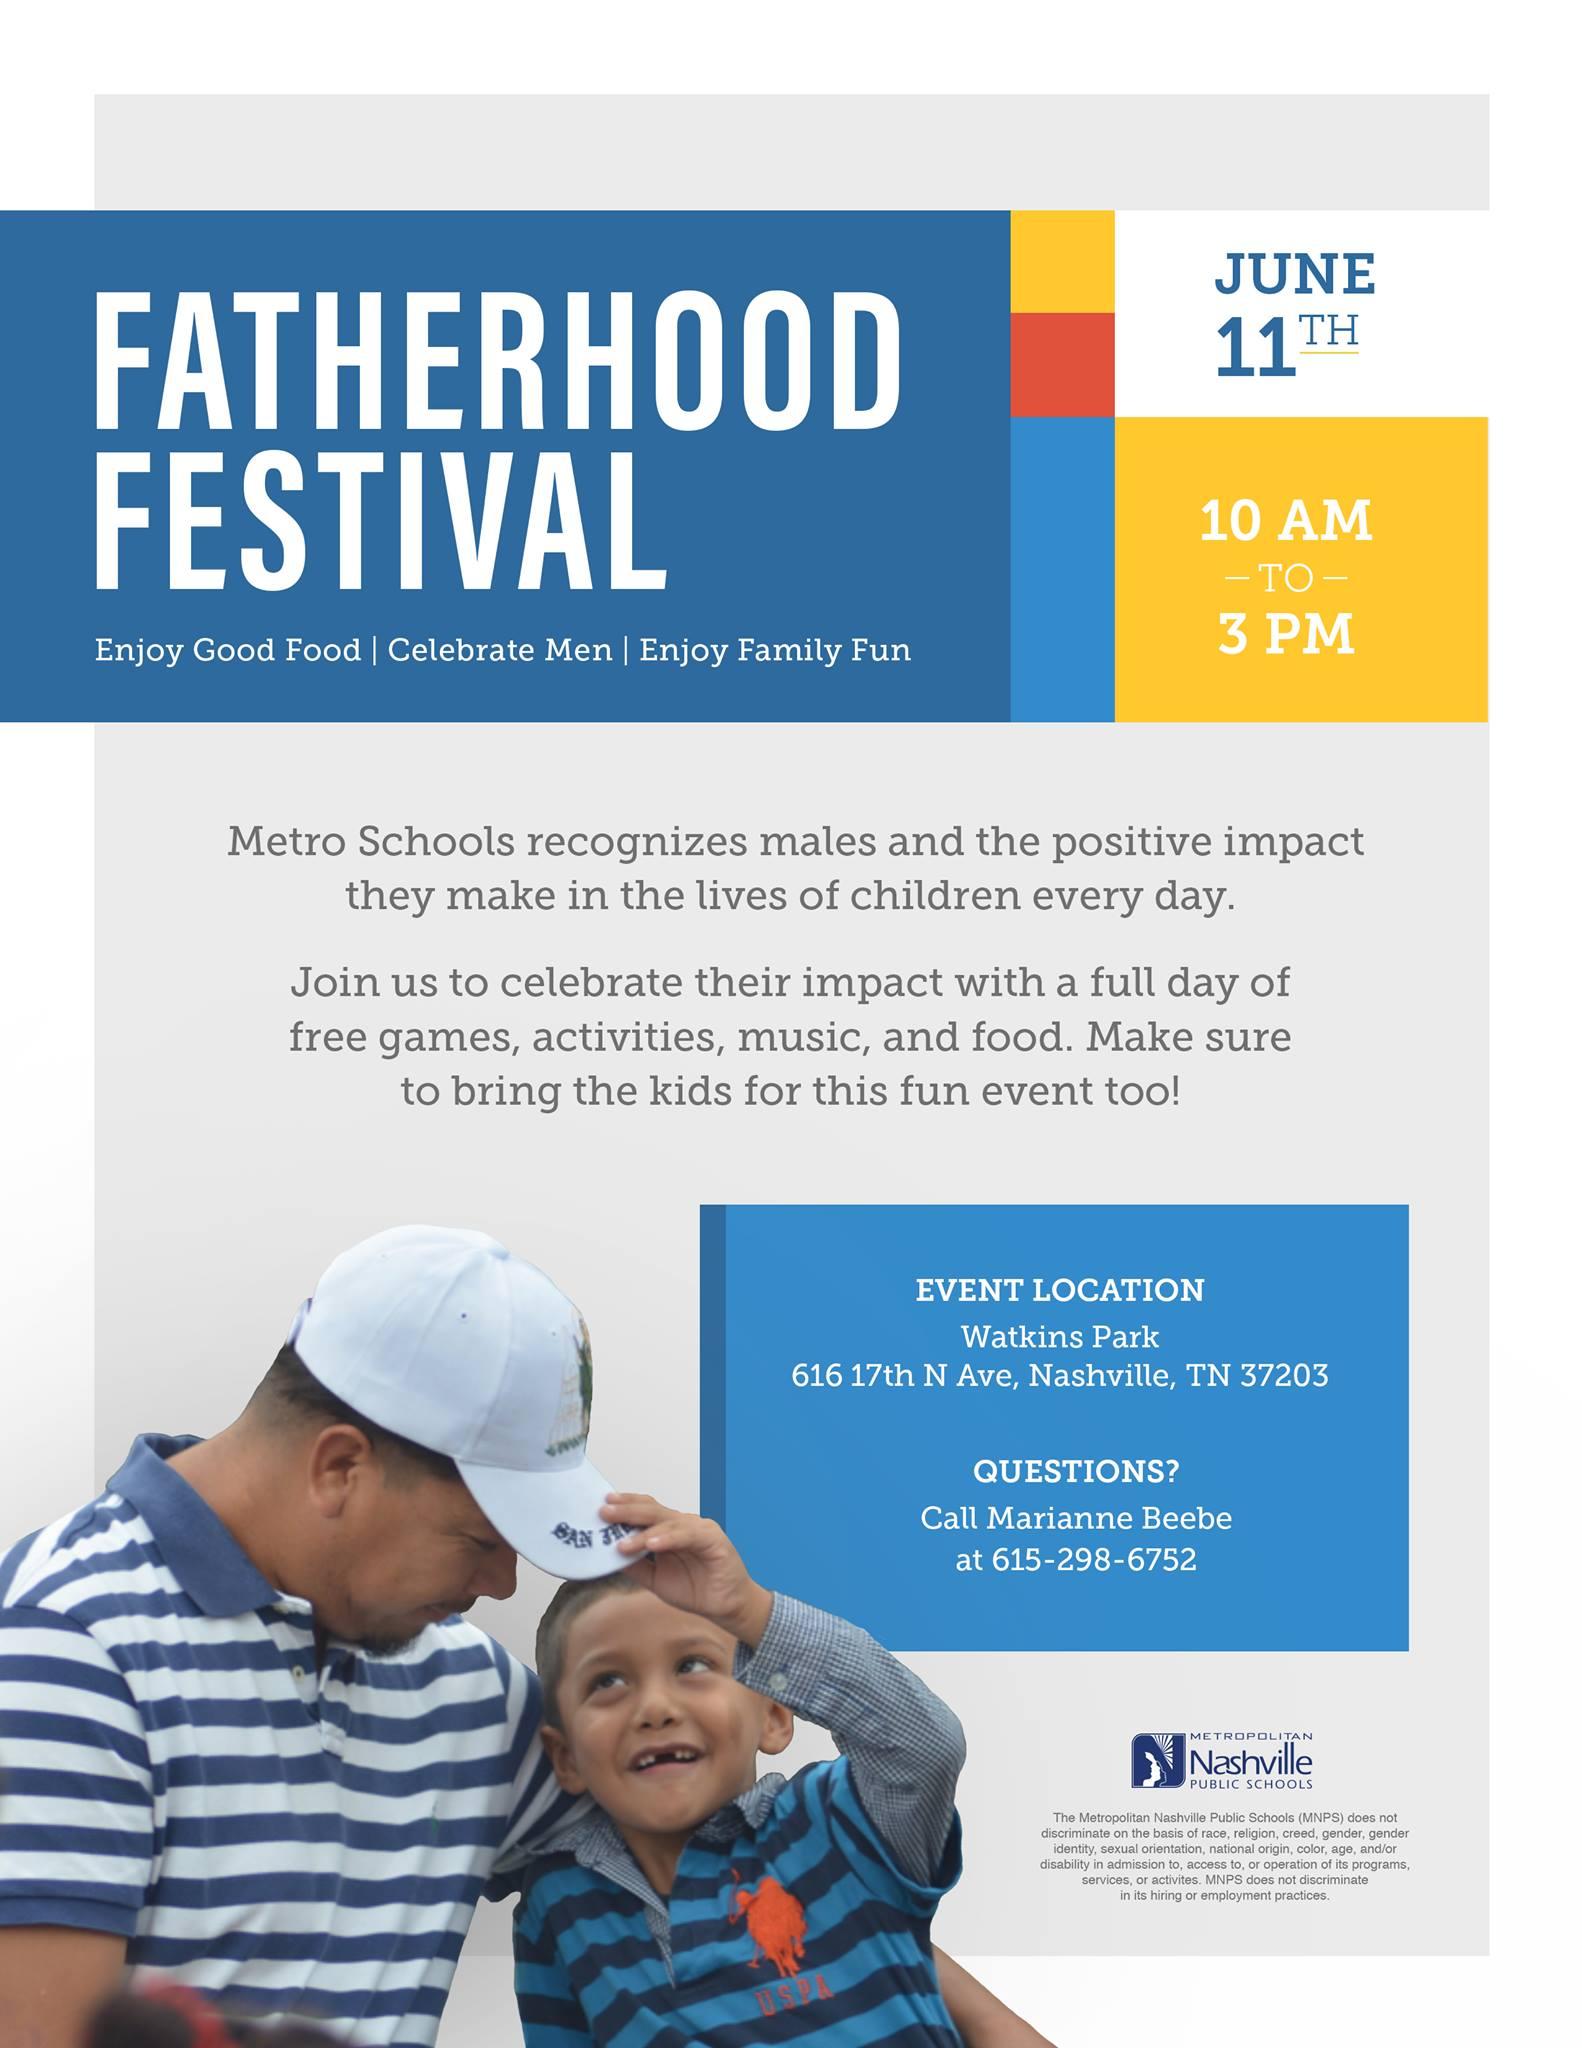 FatherhoodFestival